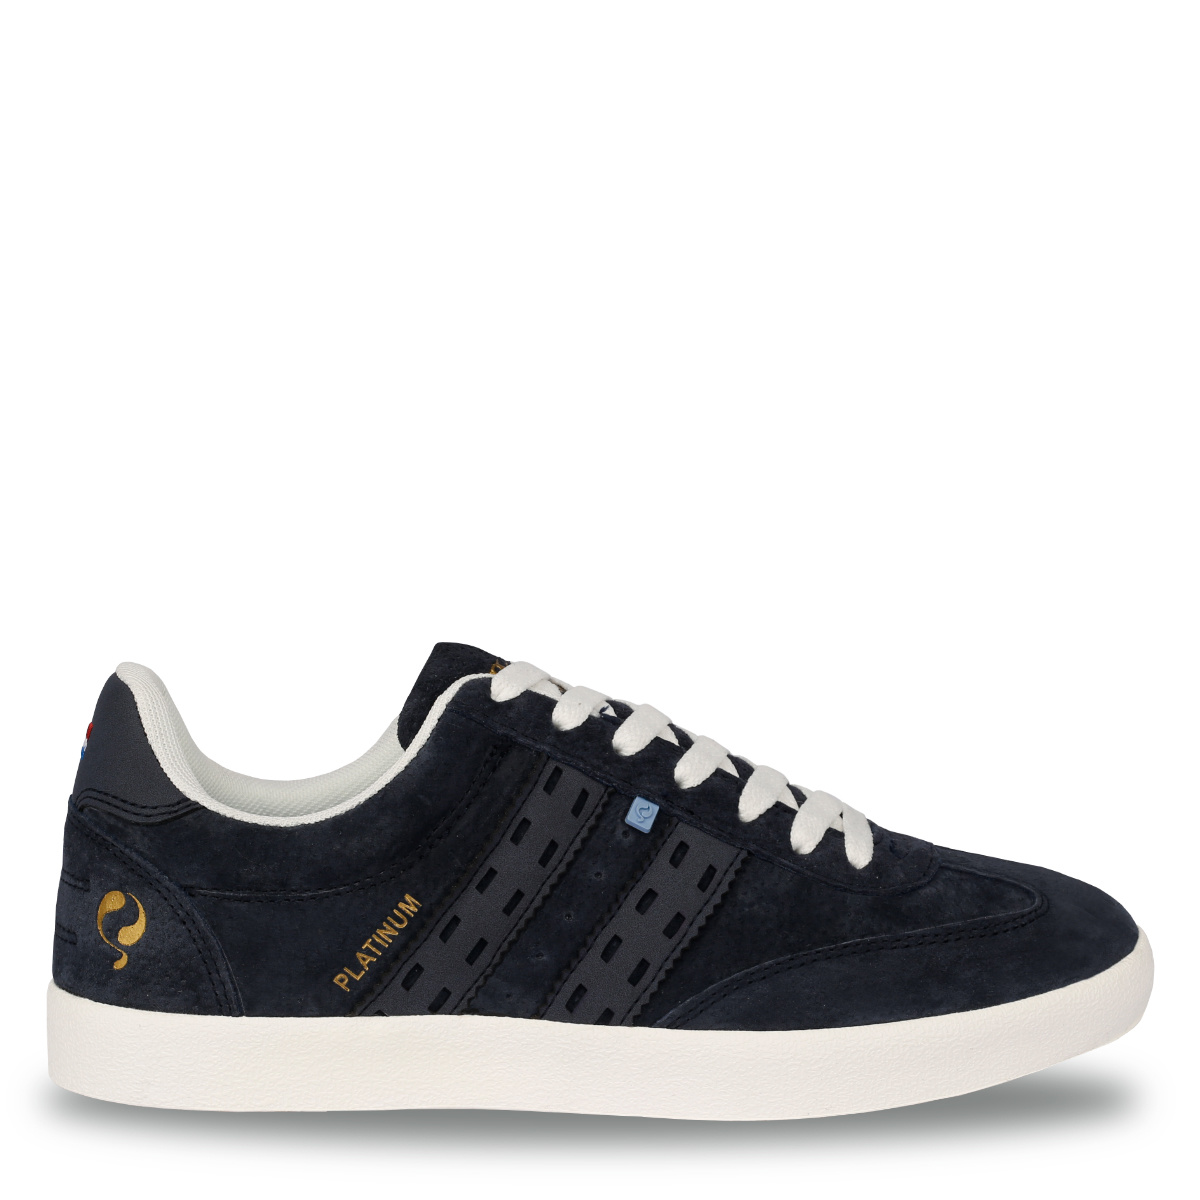 Heren Sneaker Platinum - Donkerblauw/Denim blauw